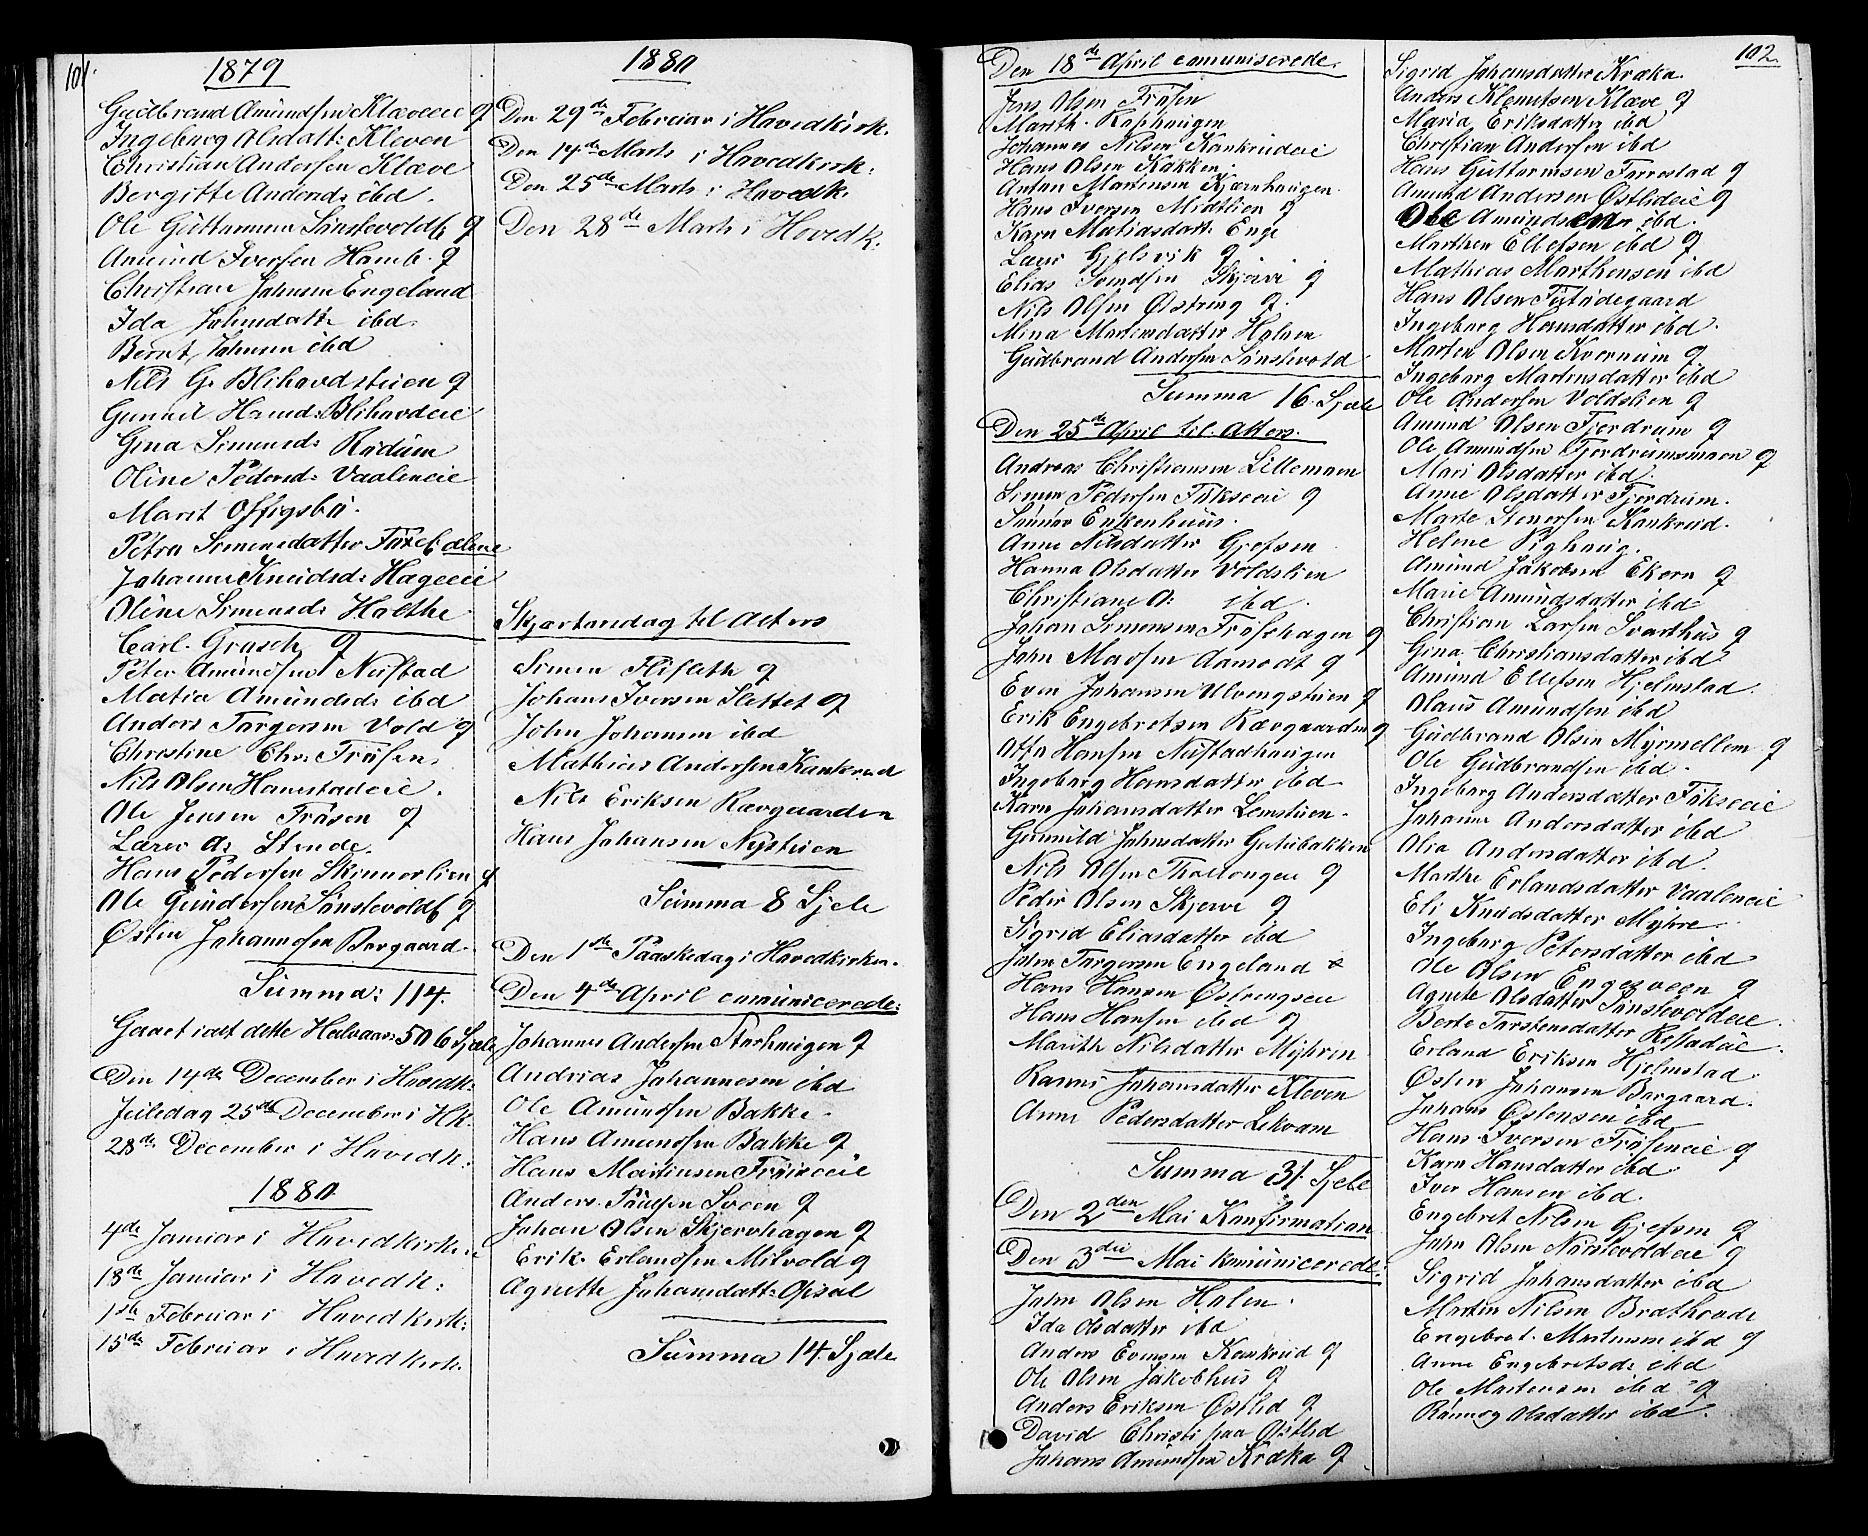 SAH, Østre Gausdal prestekontor, Klokkerbok nr. 1, 1863-1893, s. 101-102